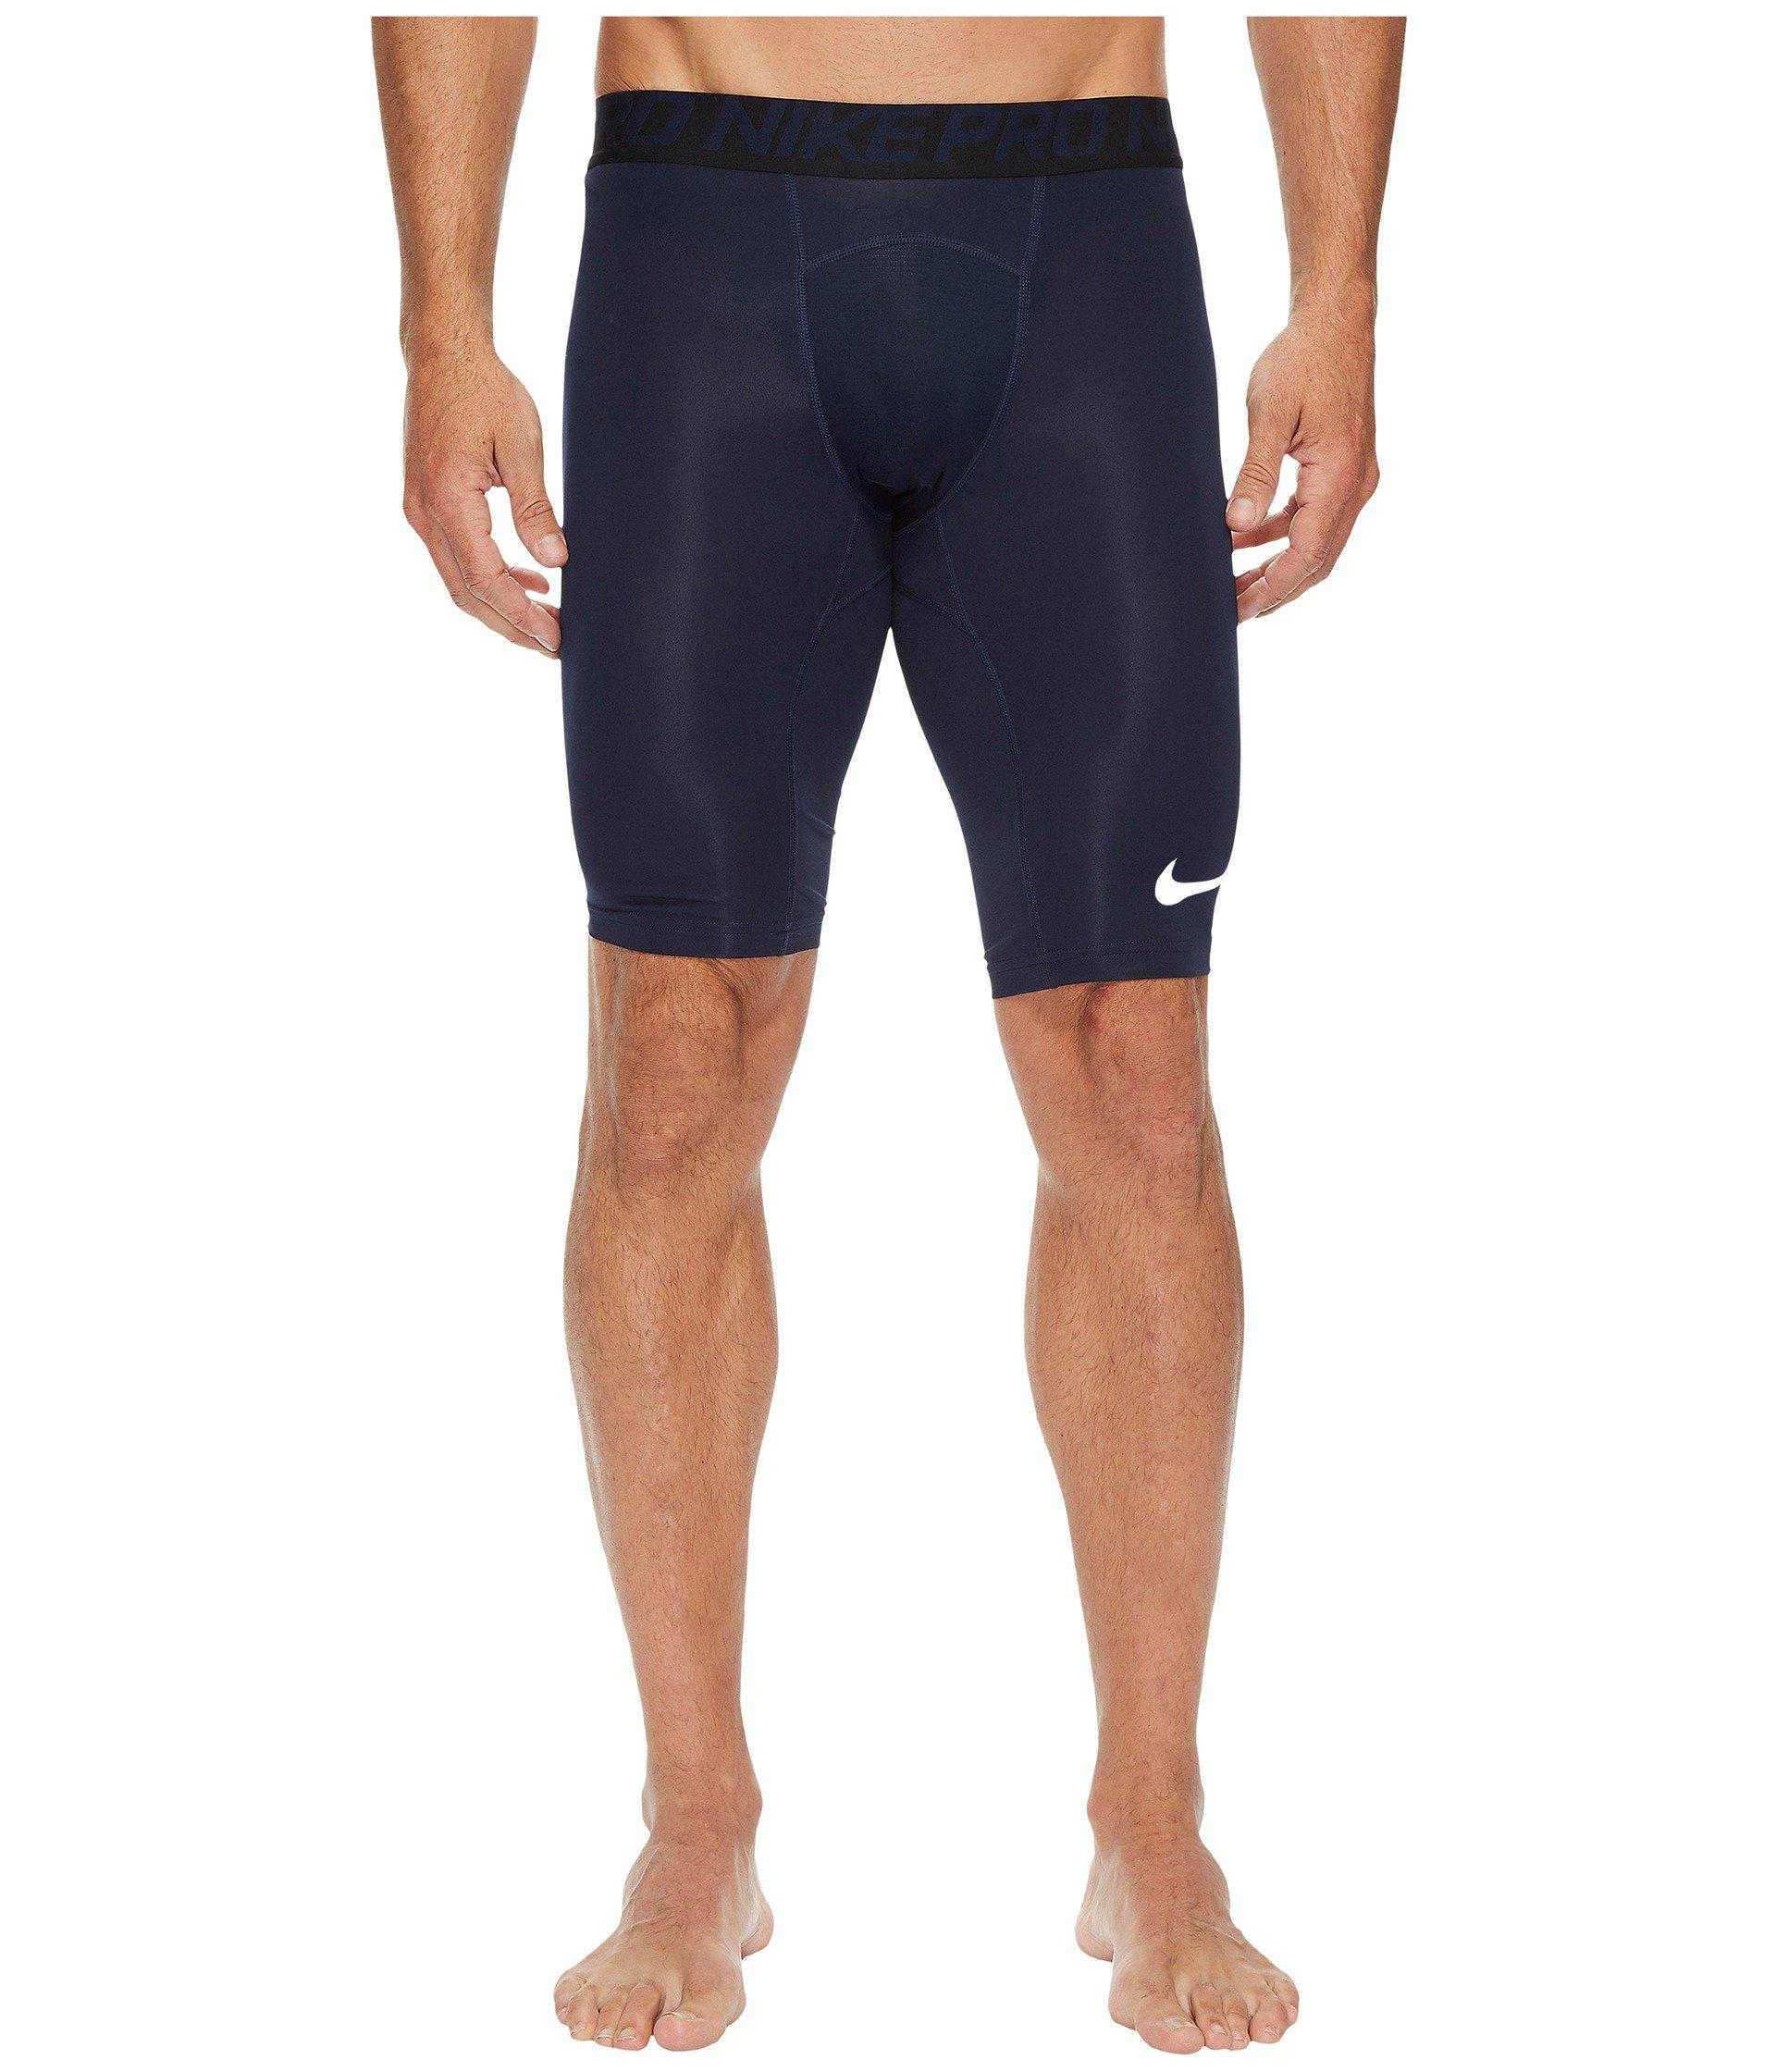 1ac8e72ccba99 Lyst - Nike Pro 9 Training Short (black/anthracite/white) Men's ...